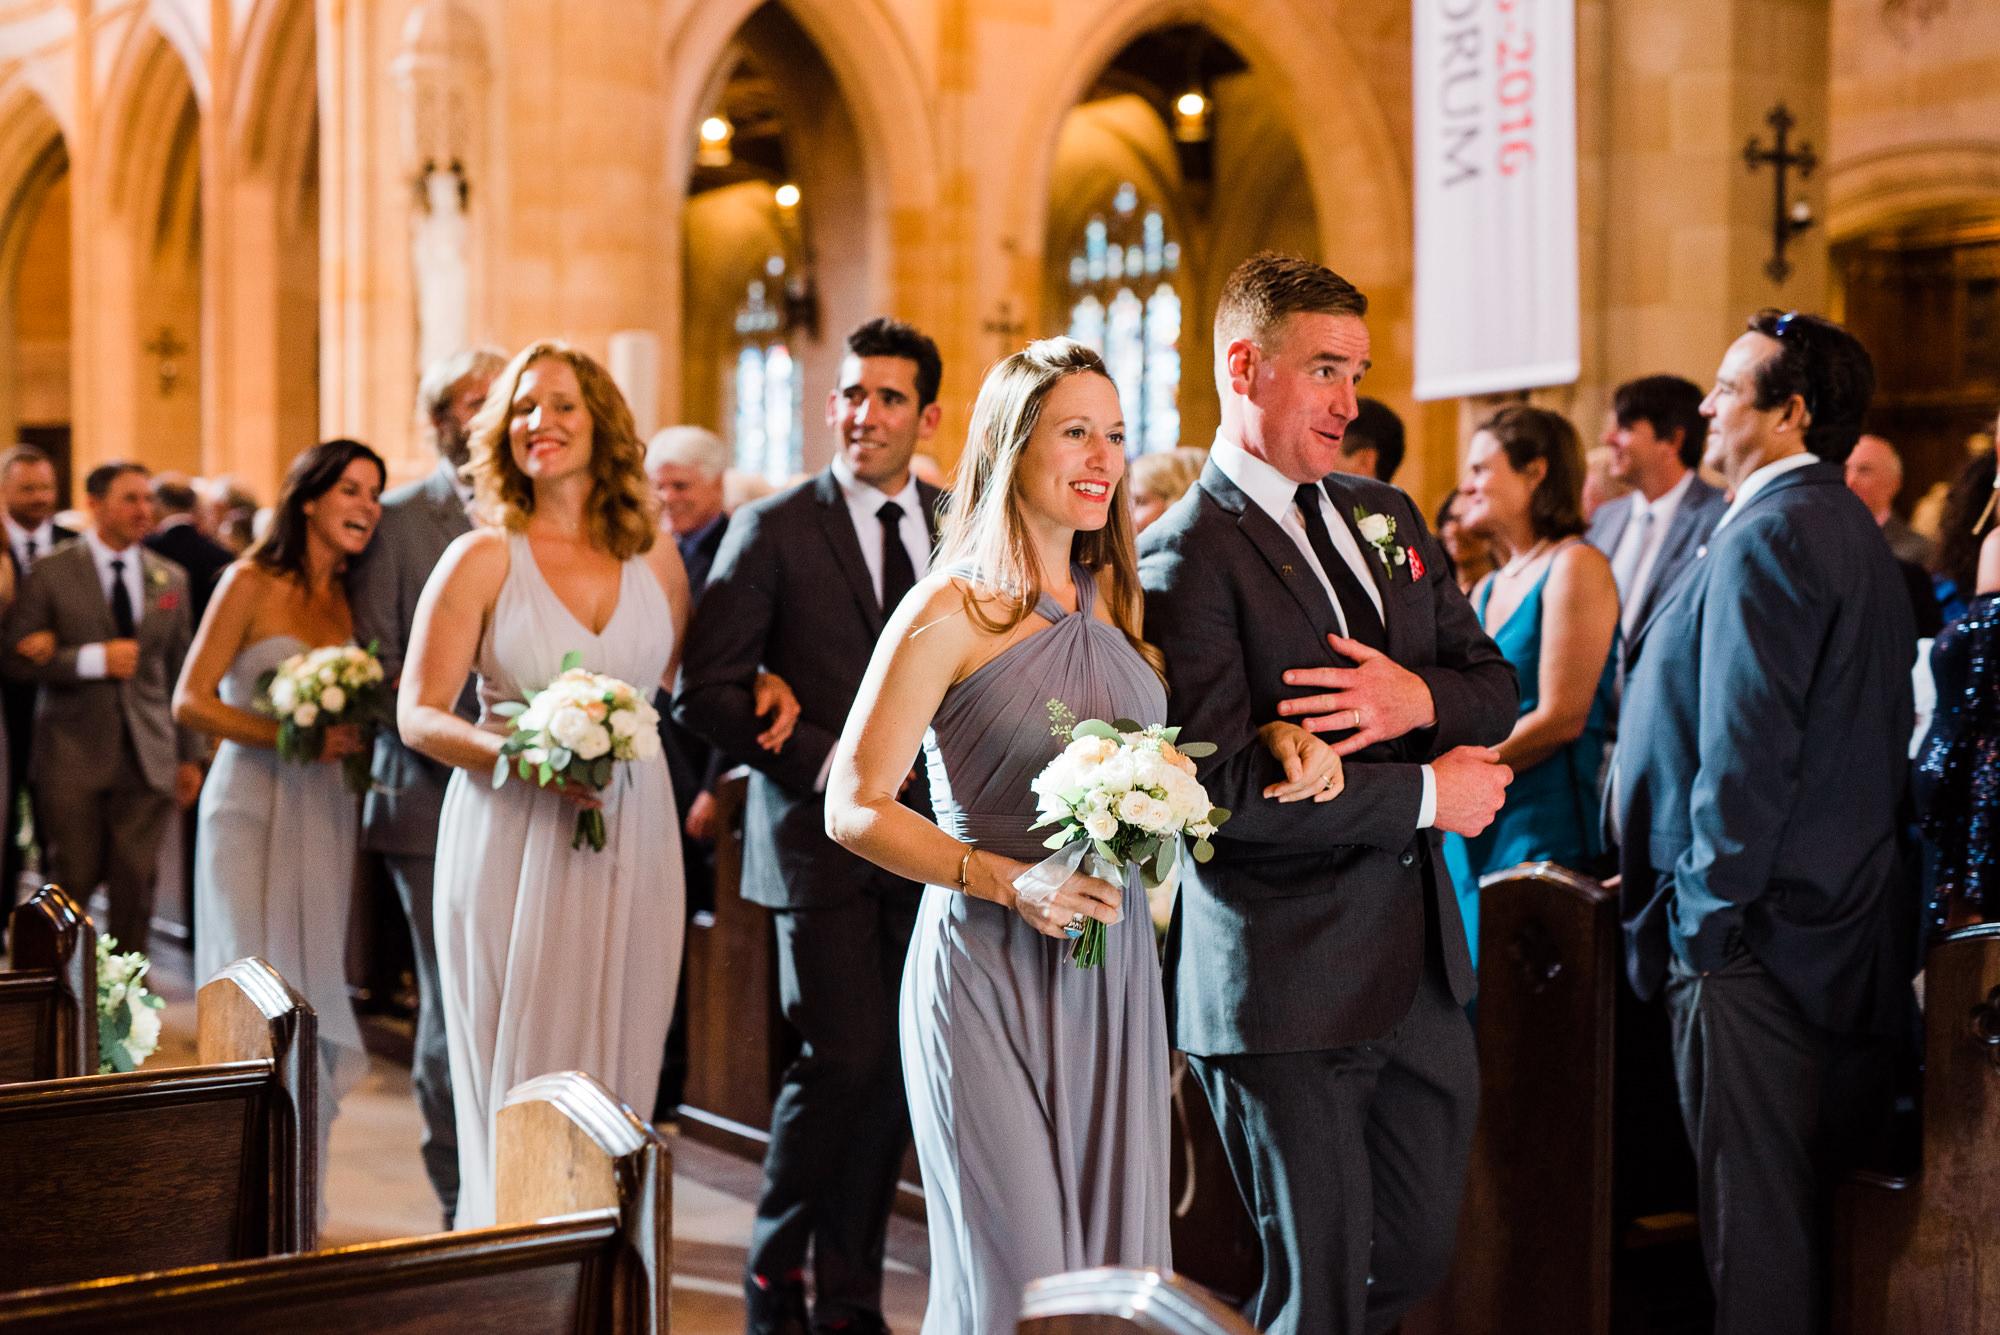 St Dominic's Catholic Church Presidio Clubhouse Wedding 031.jpg